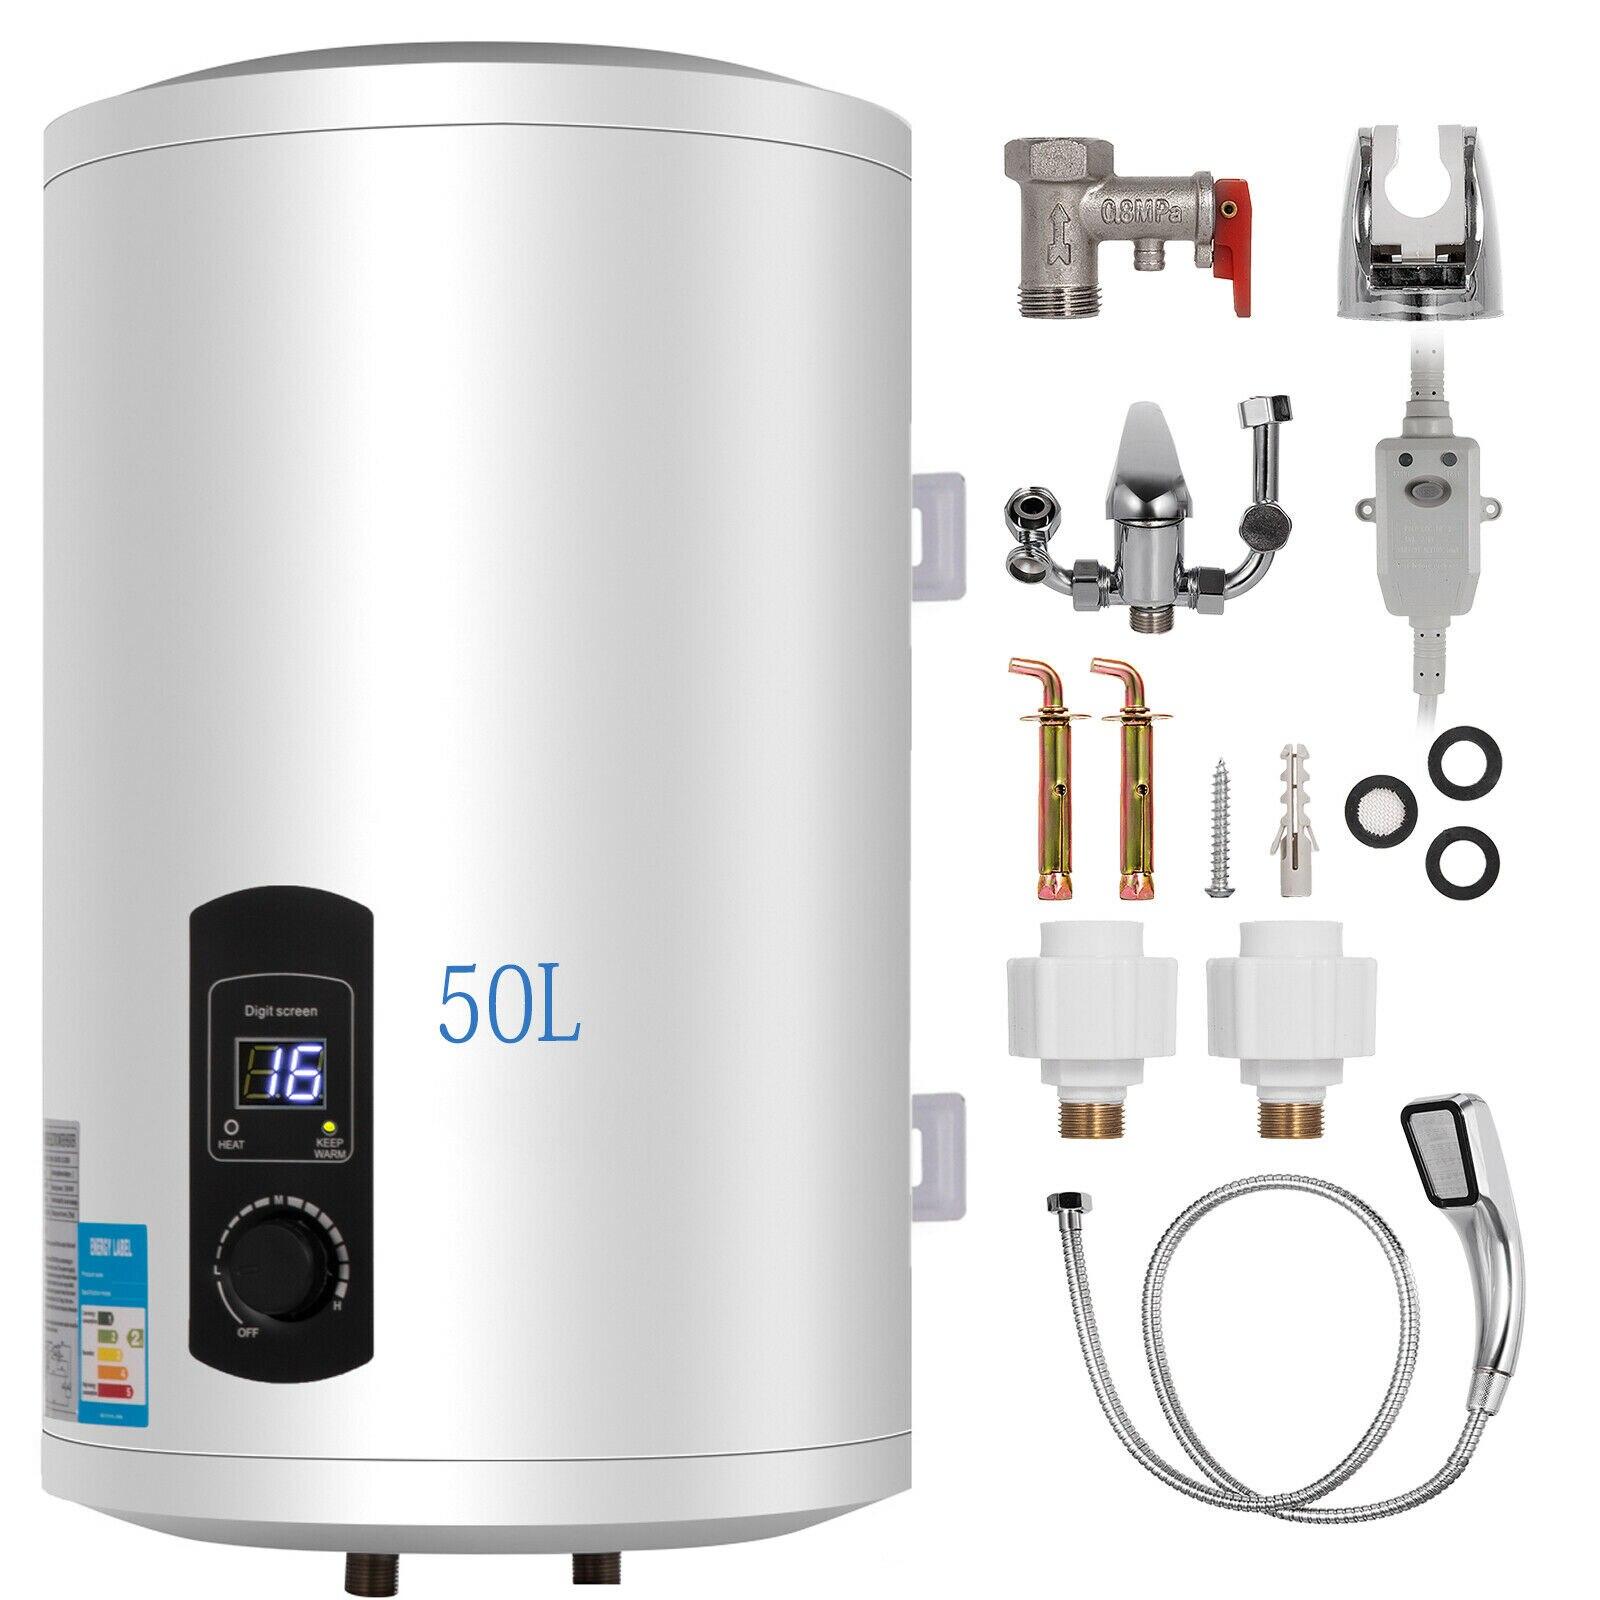 50L Electric Hot Water Tank Boiler Electric Storage Electric Boiler Vertical